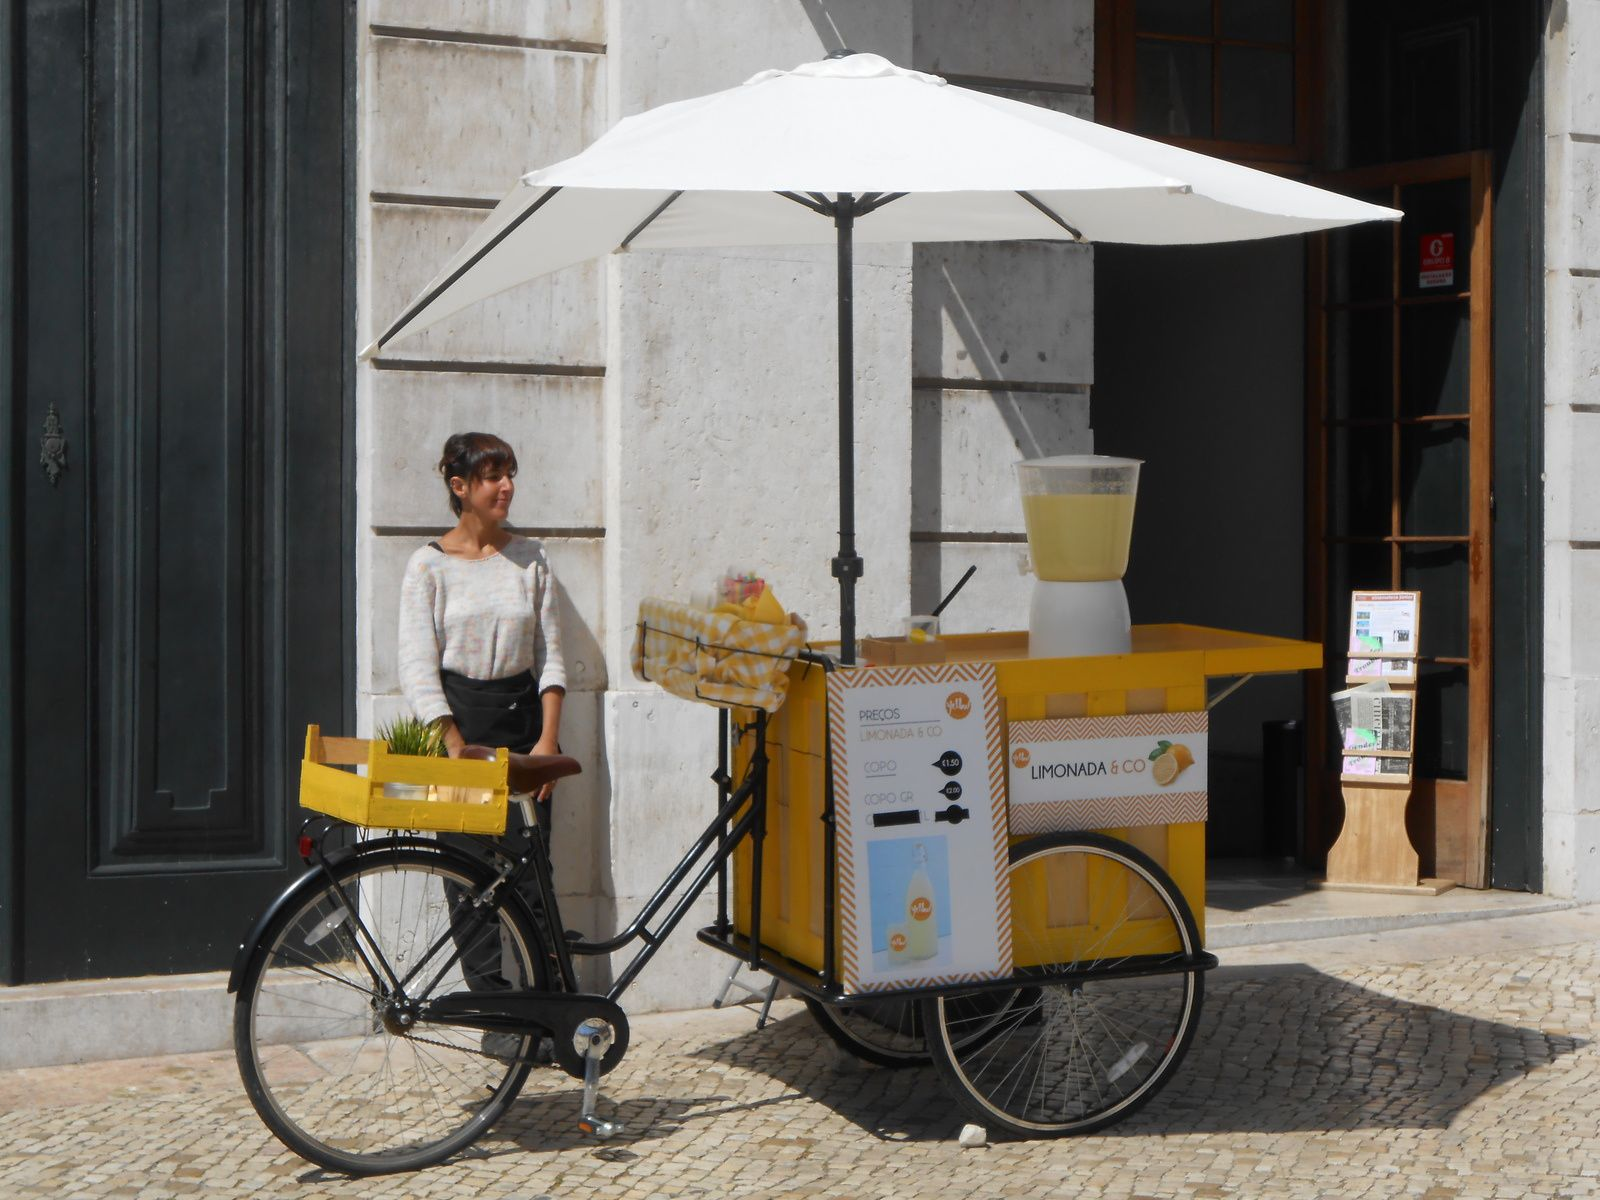 Lisbonne, mai 2015